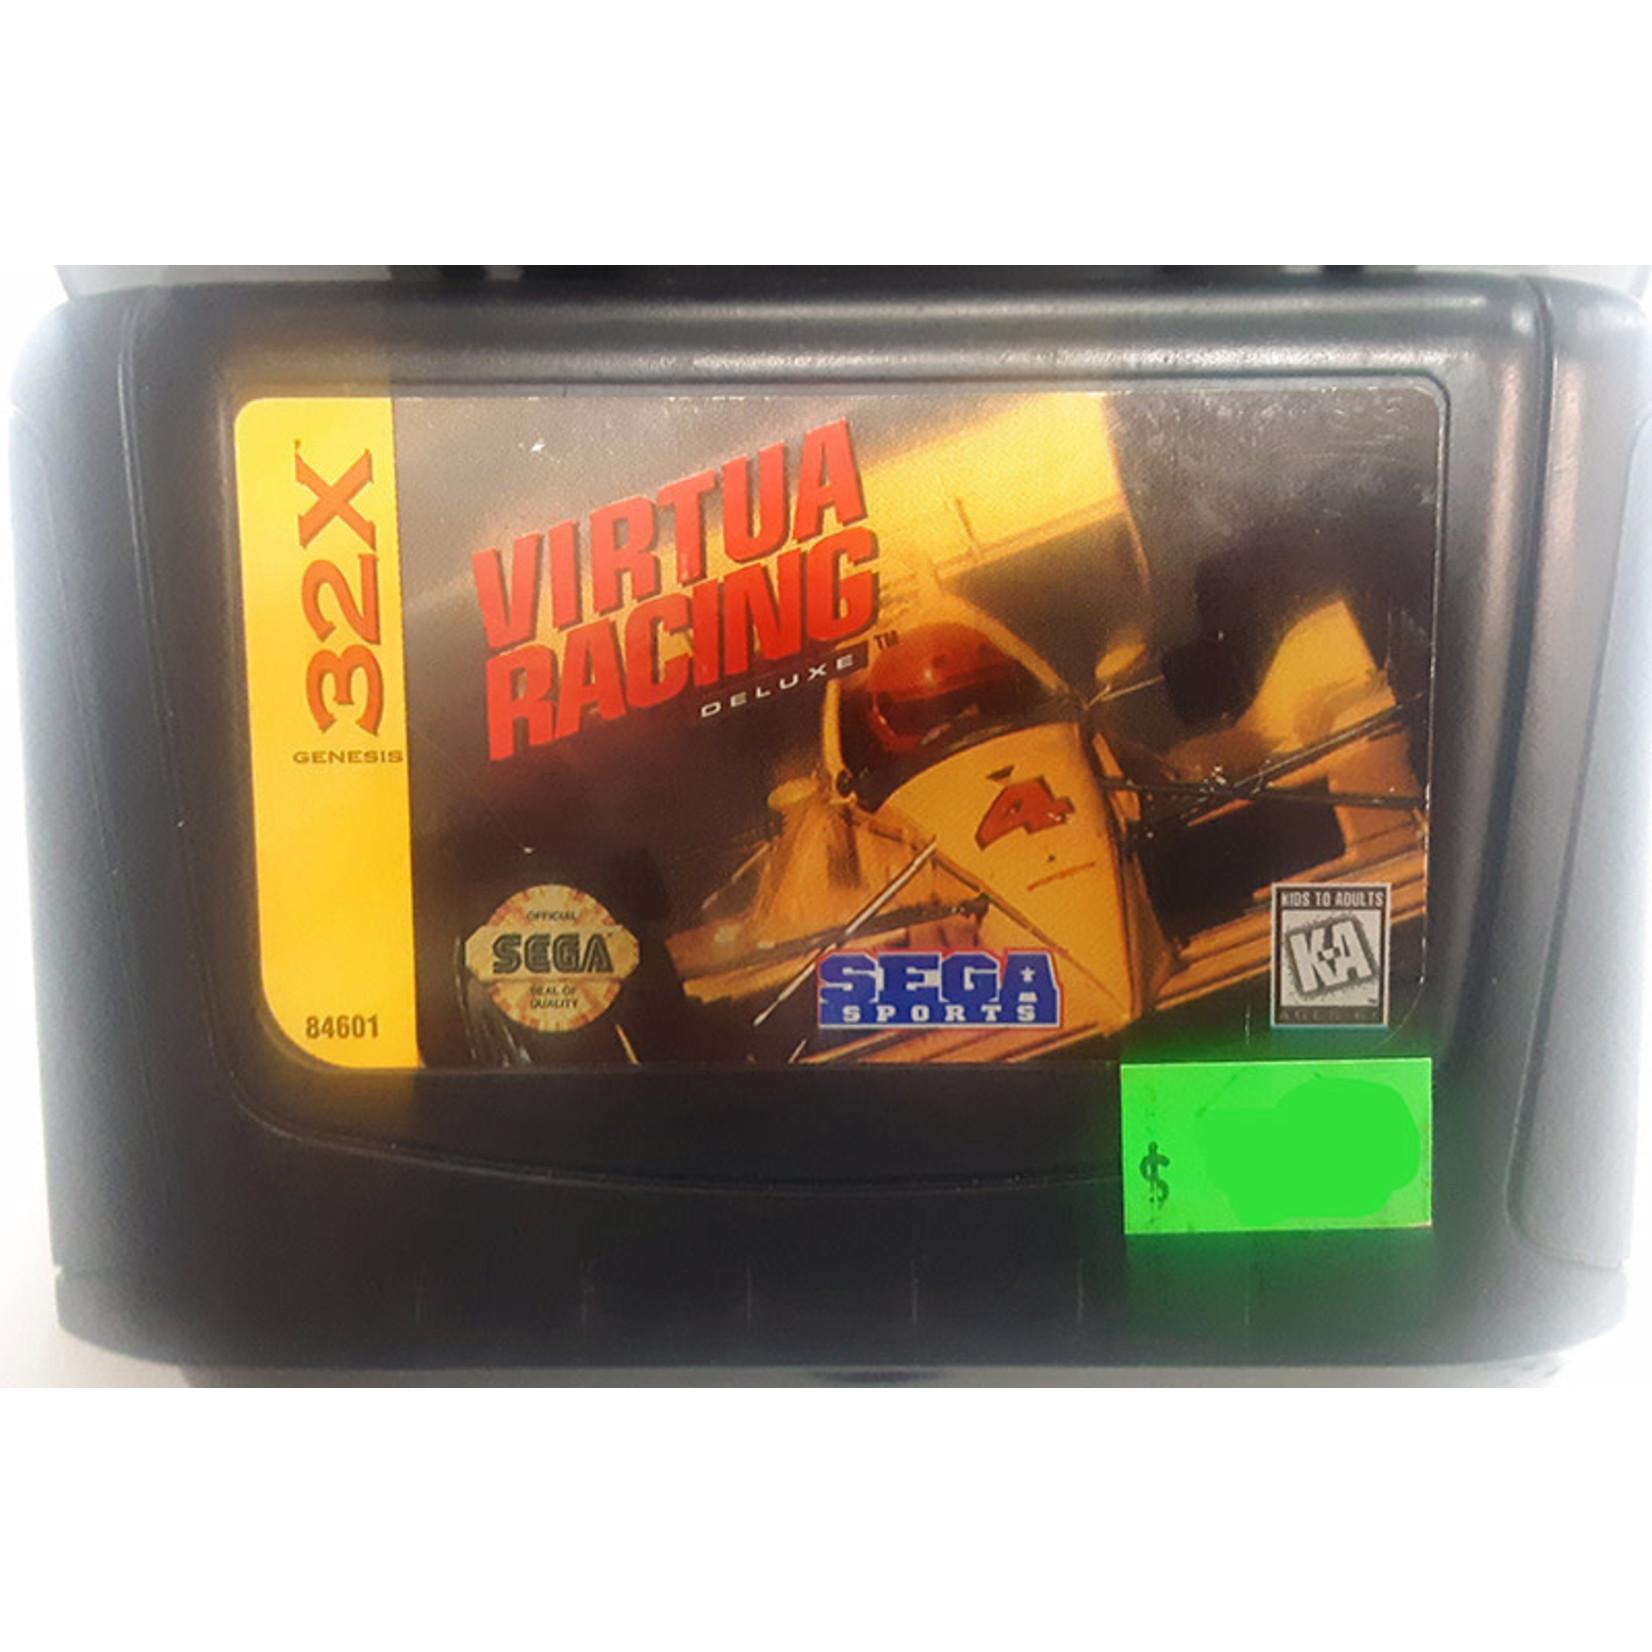 32xu-Virtua Racing